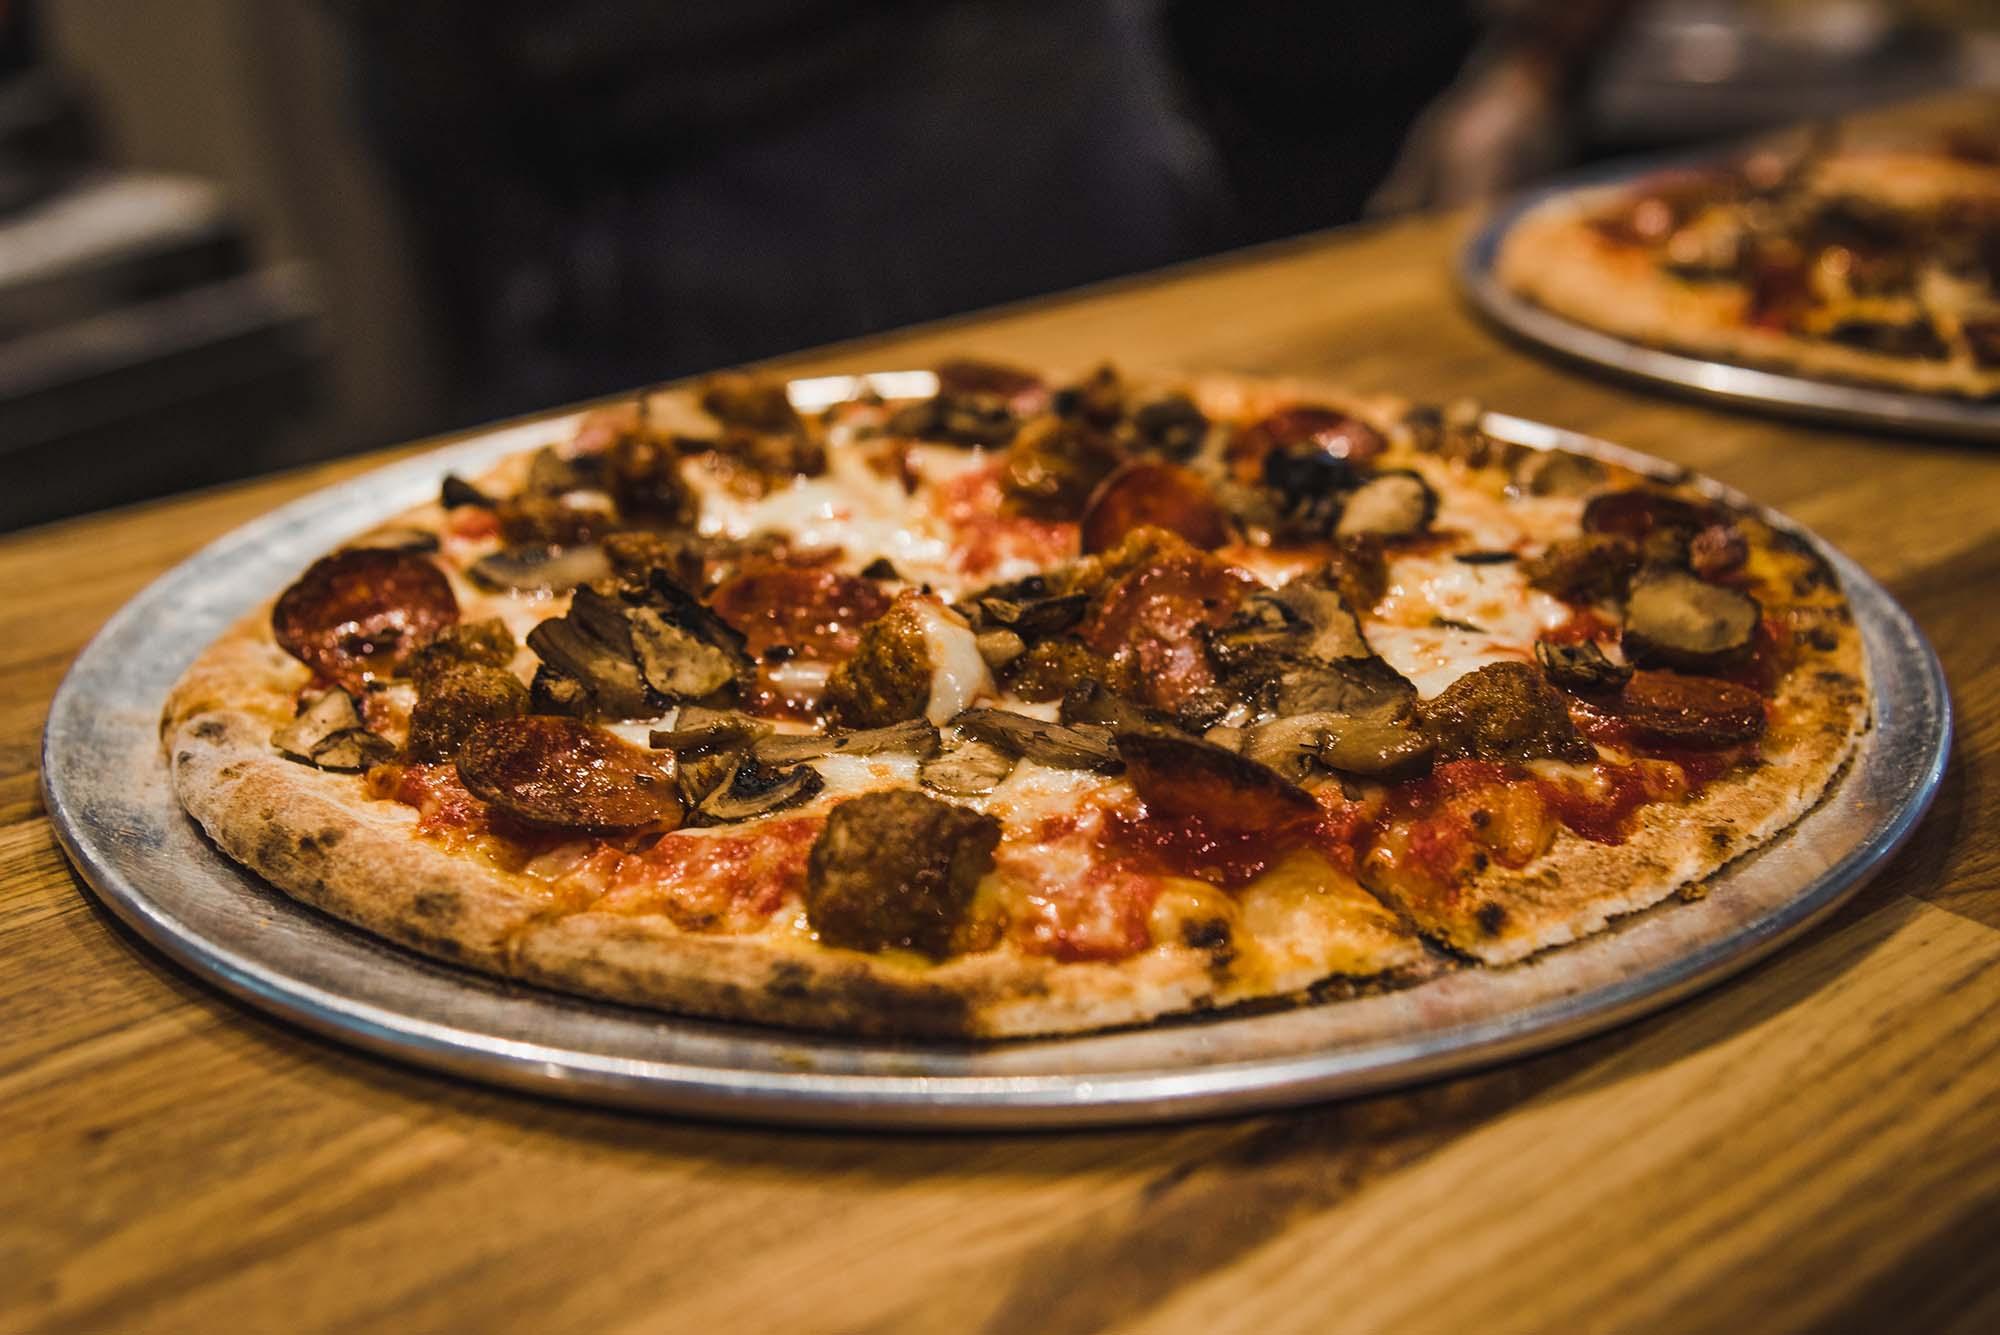 Pizza Restaurant Newark OH | Pizza Restaurant Near Me